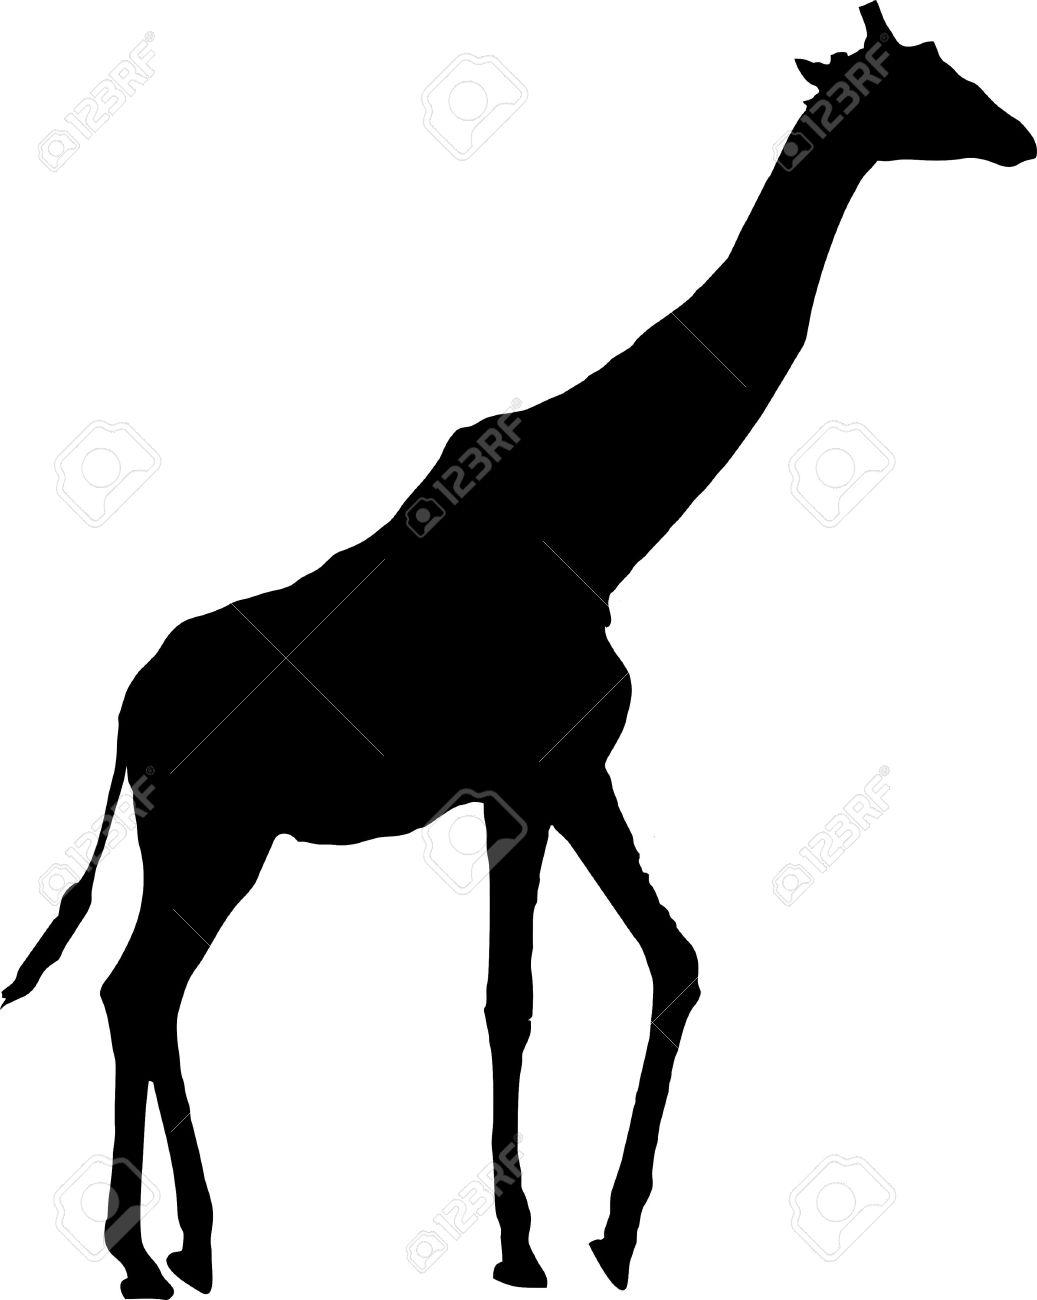 1037x1300 Best Giraffe Silhouette